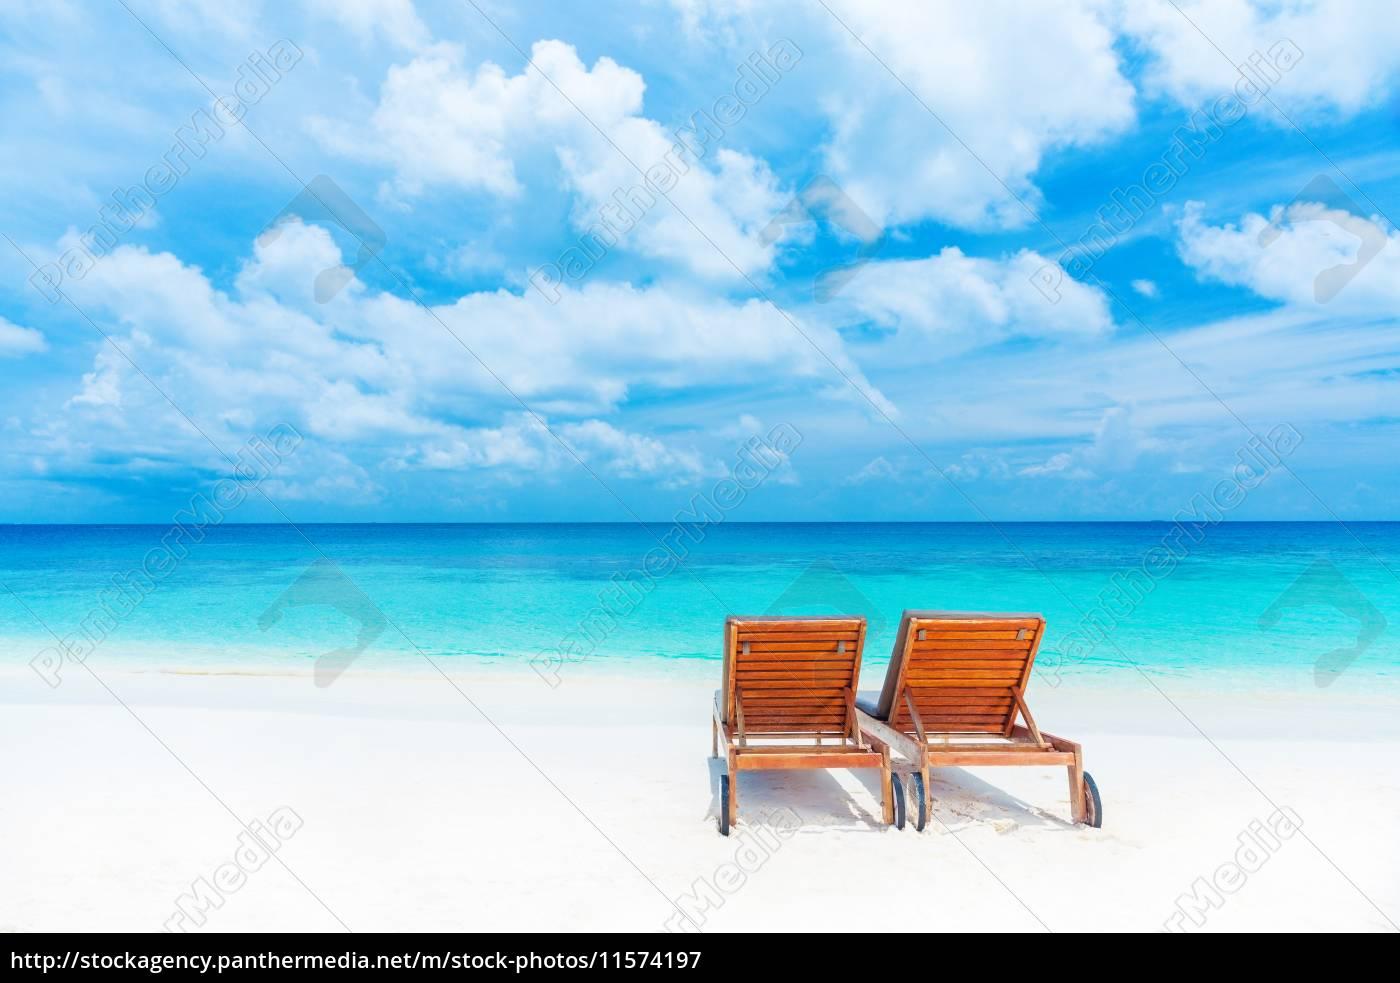 zwei leere liegestuhl am strand lizenzfreies bild 11574197 bildagentur panthermedia. Black Bedroom Furniture Sets. Home Design Ideas